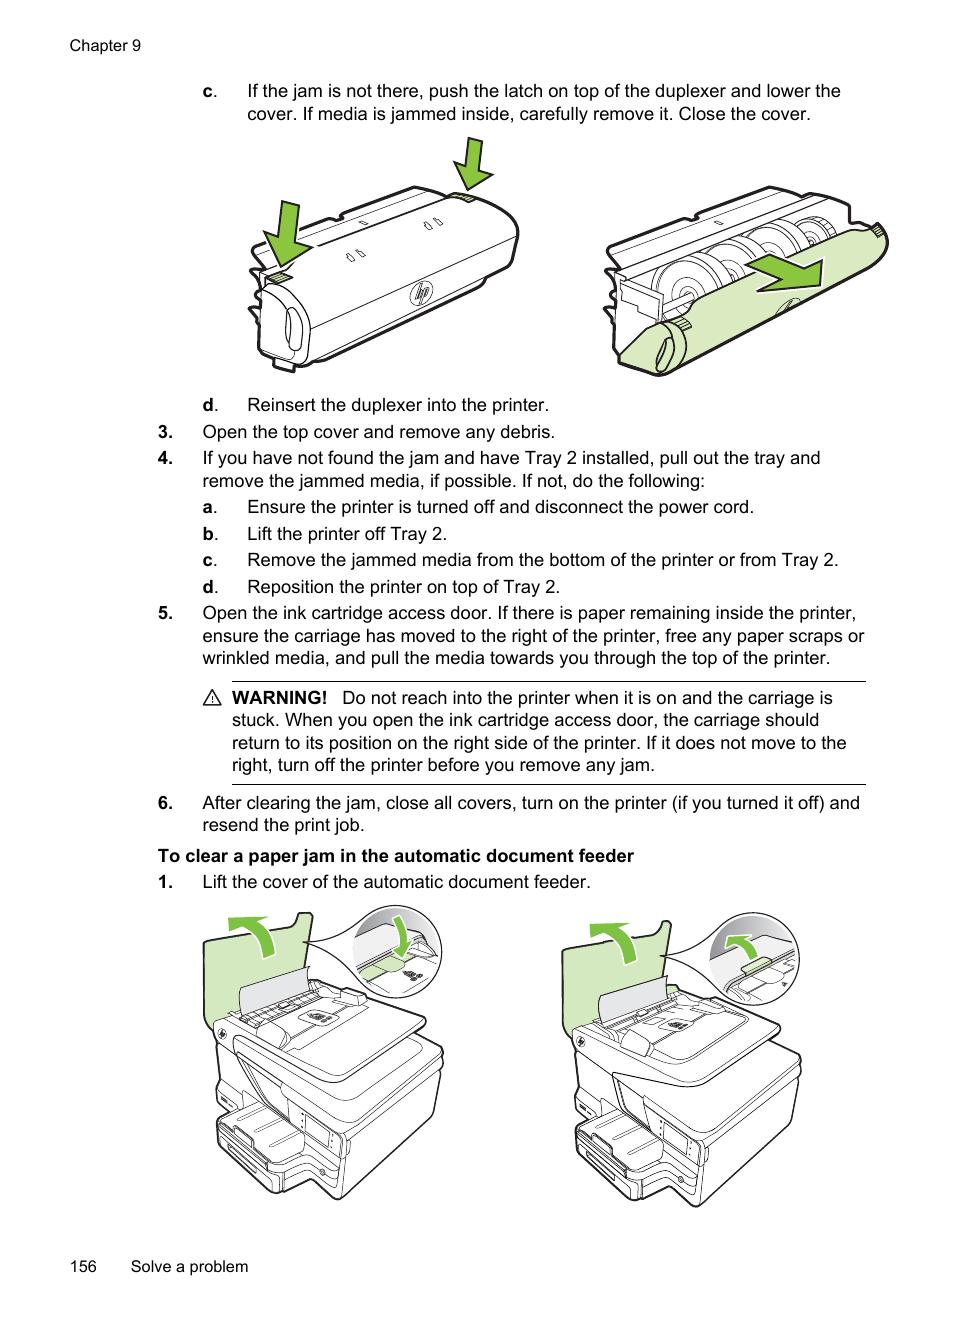 СНПЧ для HP OfficeJet Pro 8600 Инструкция